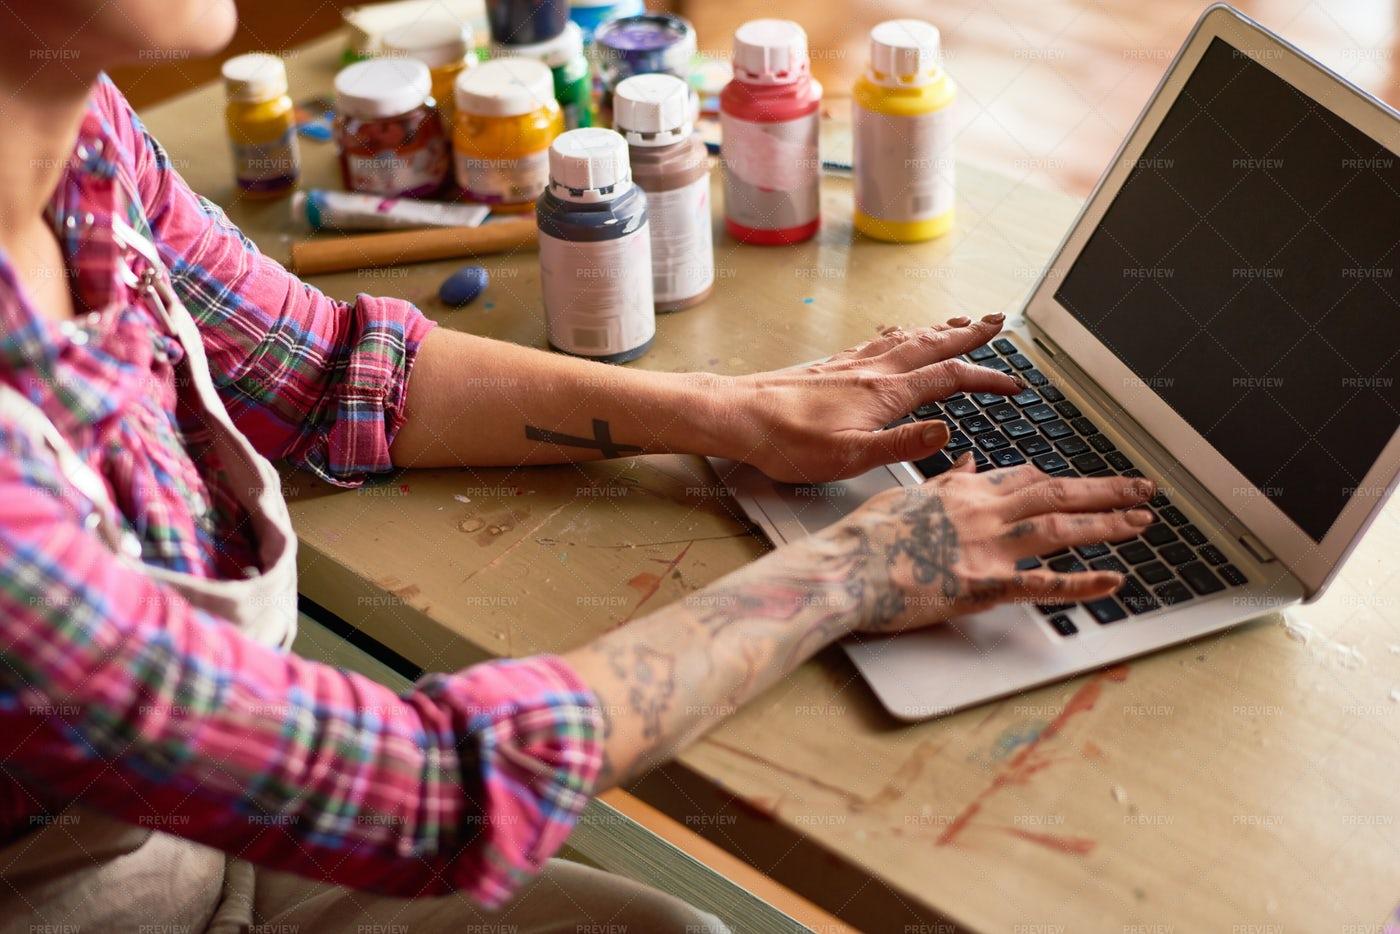 Tattooed Woman Using Laptop: Stock Photos